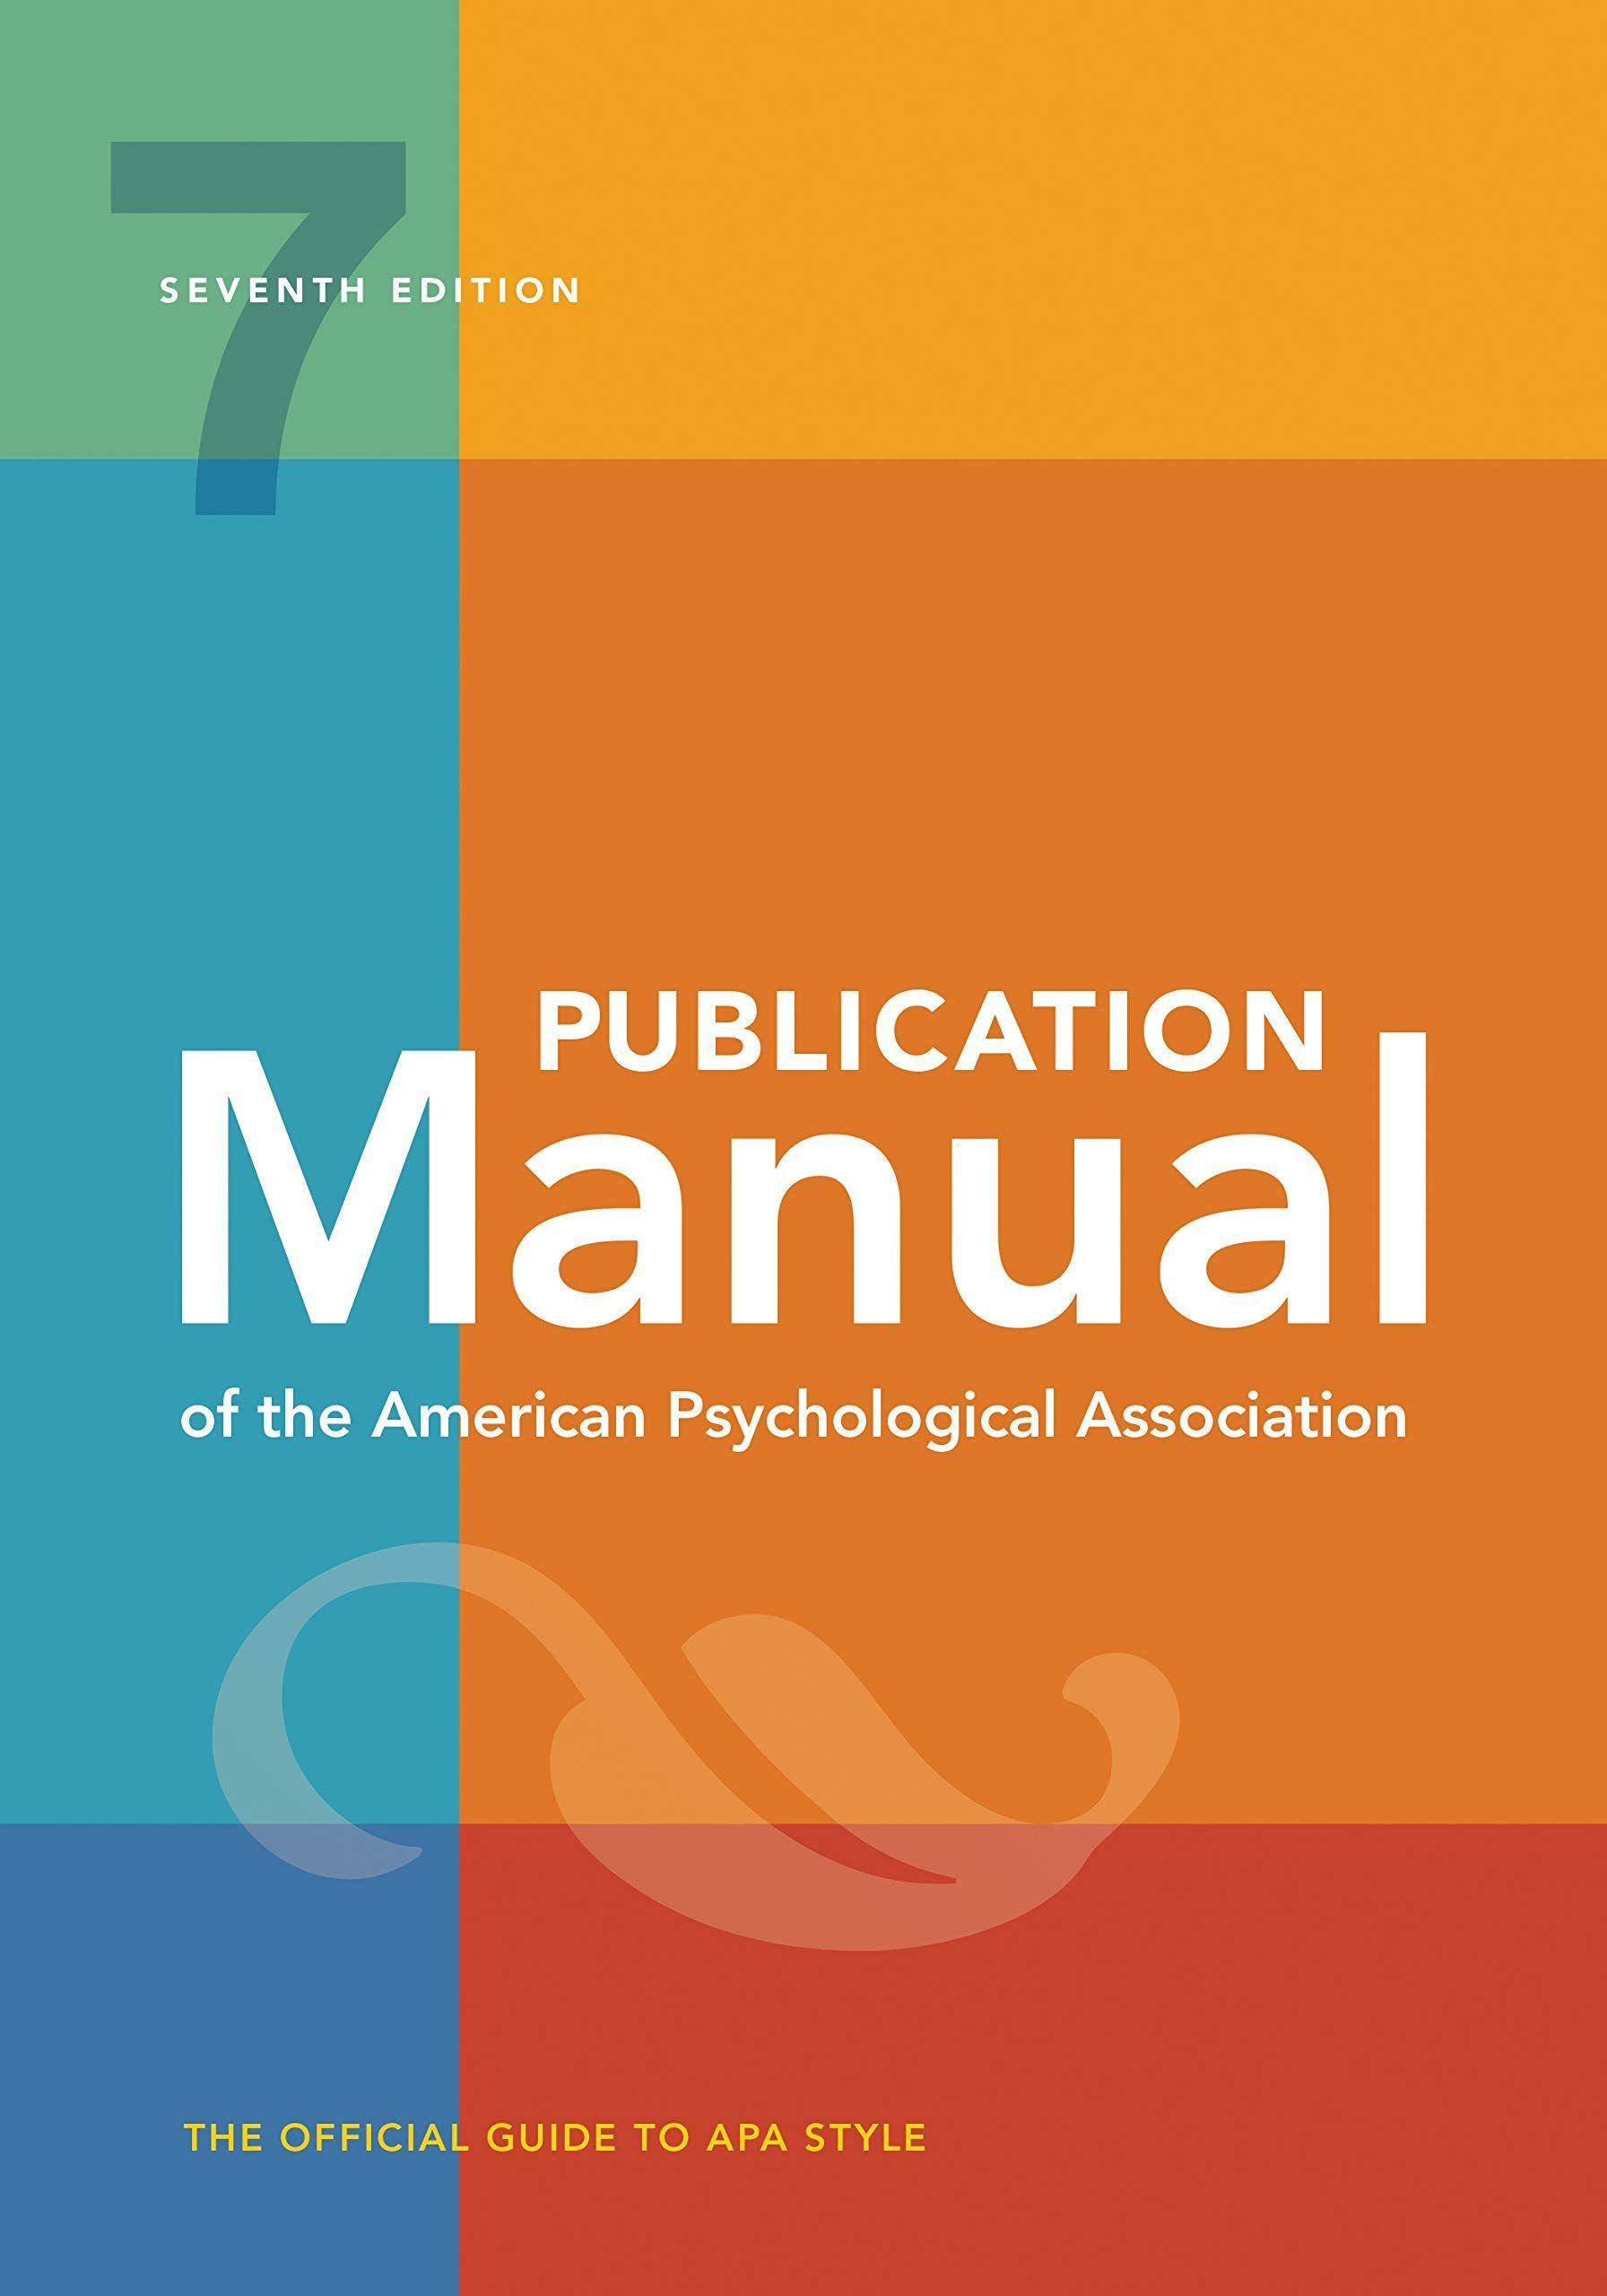 Publication Manual Of The American Psychological Association 7th Edition 2020 Copyright To Rent Norma Apa Practica De Escritura Intervalo Confianza How Cite A Book Chapter